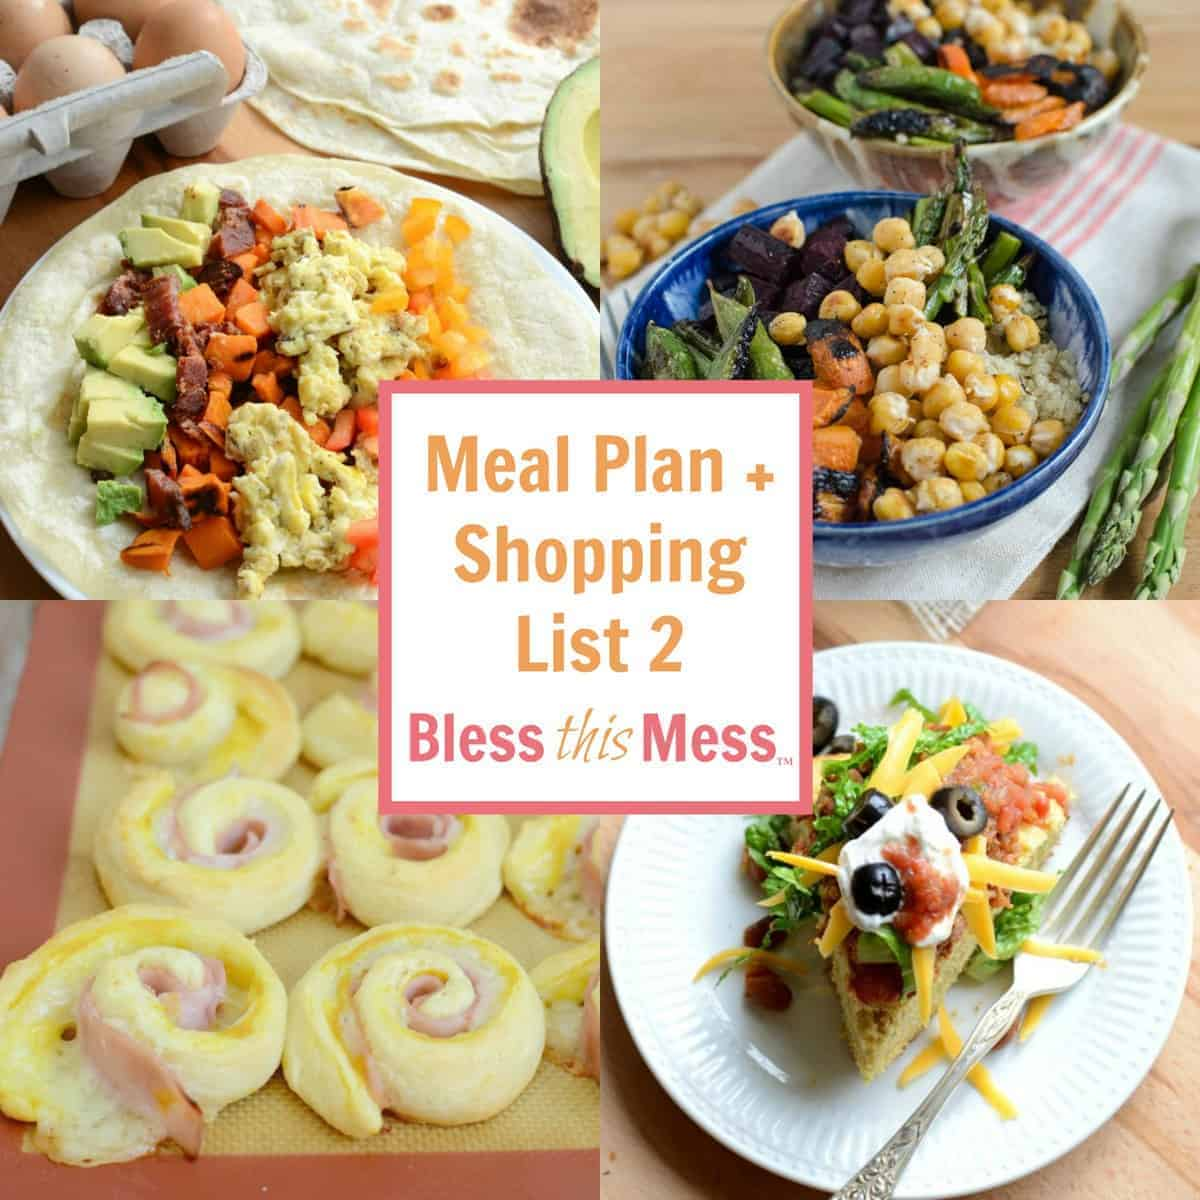 Easy Family Meal Plan 2 + Printable Shopping List